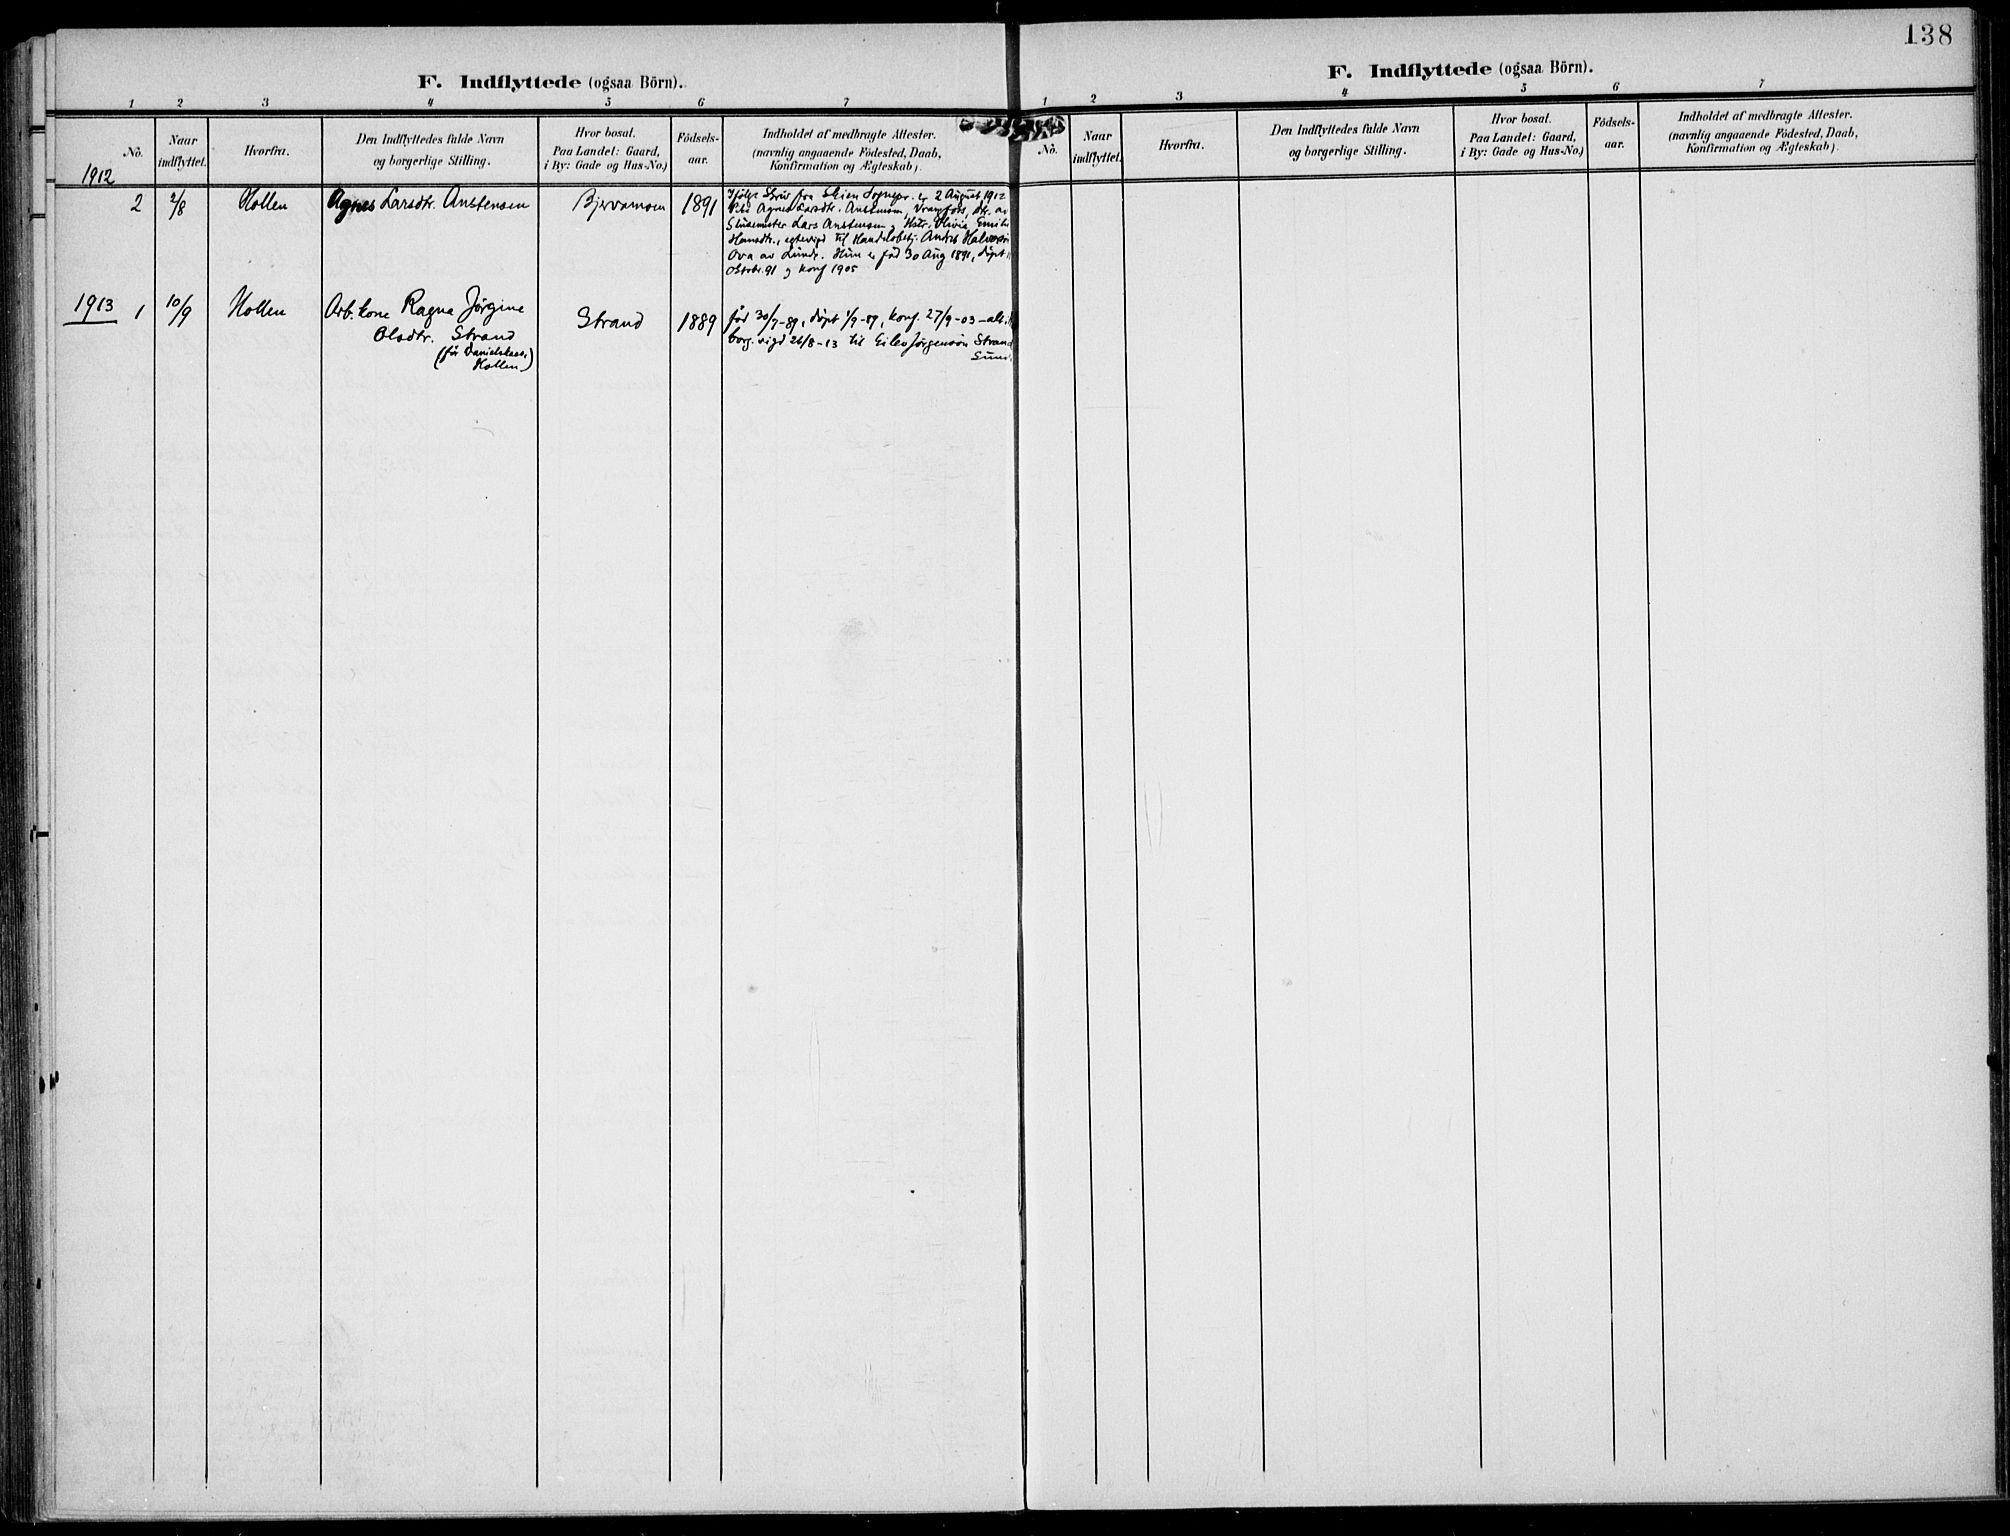 SAKO, Lunde kirkebøker, F/Fa/L0004: Ministerialbok nr. I 4, 1902-1913, s. 138